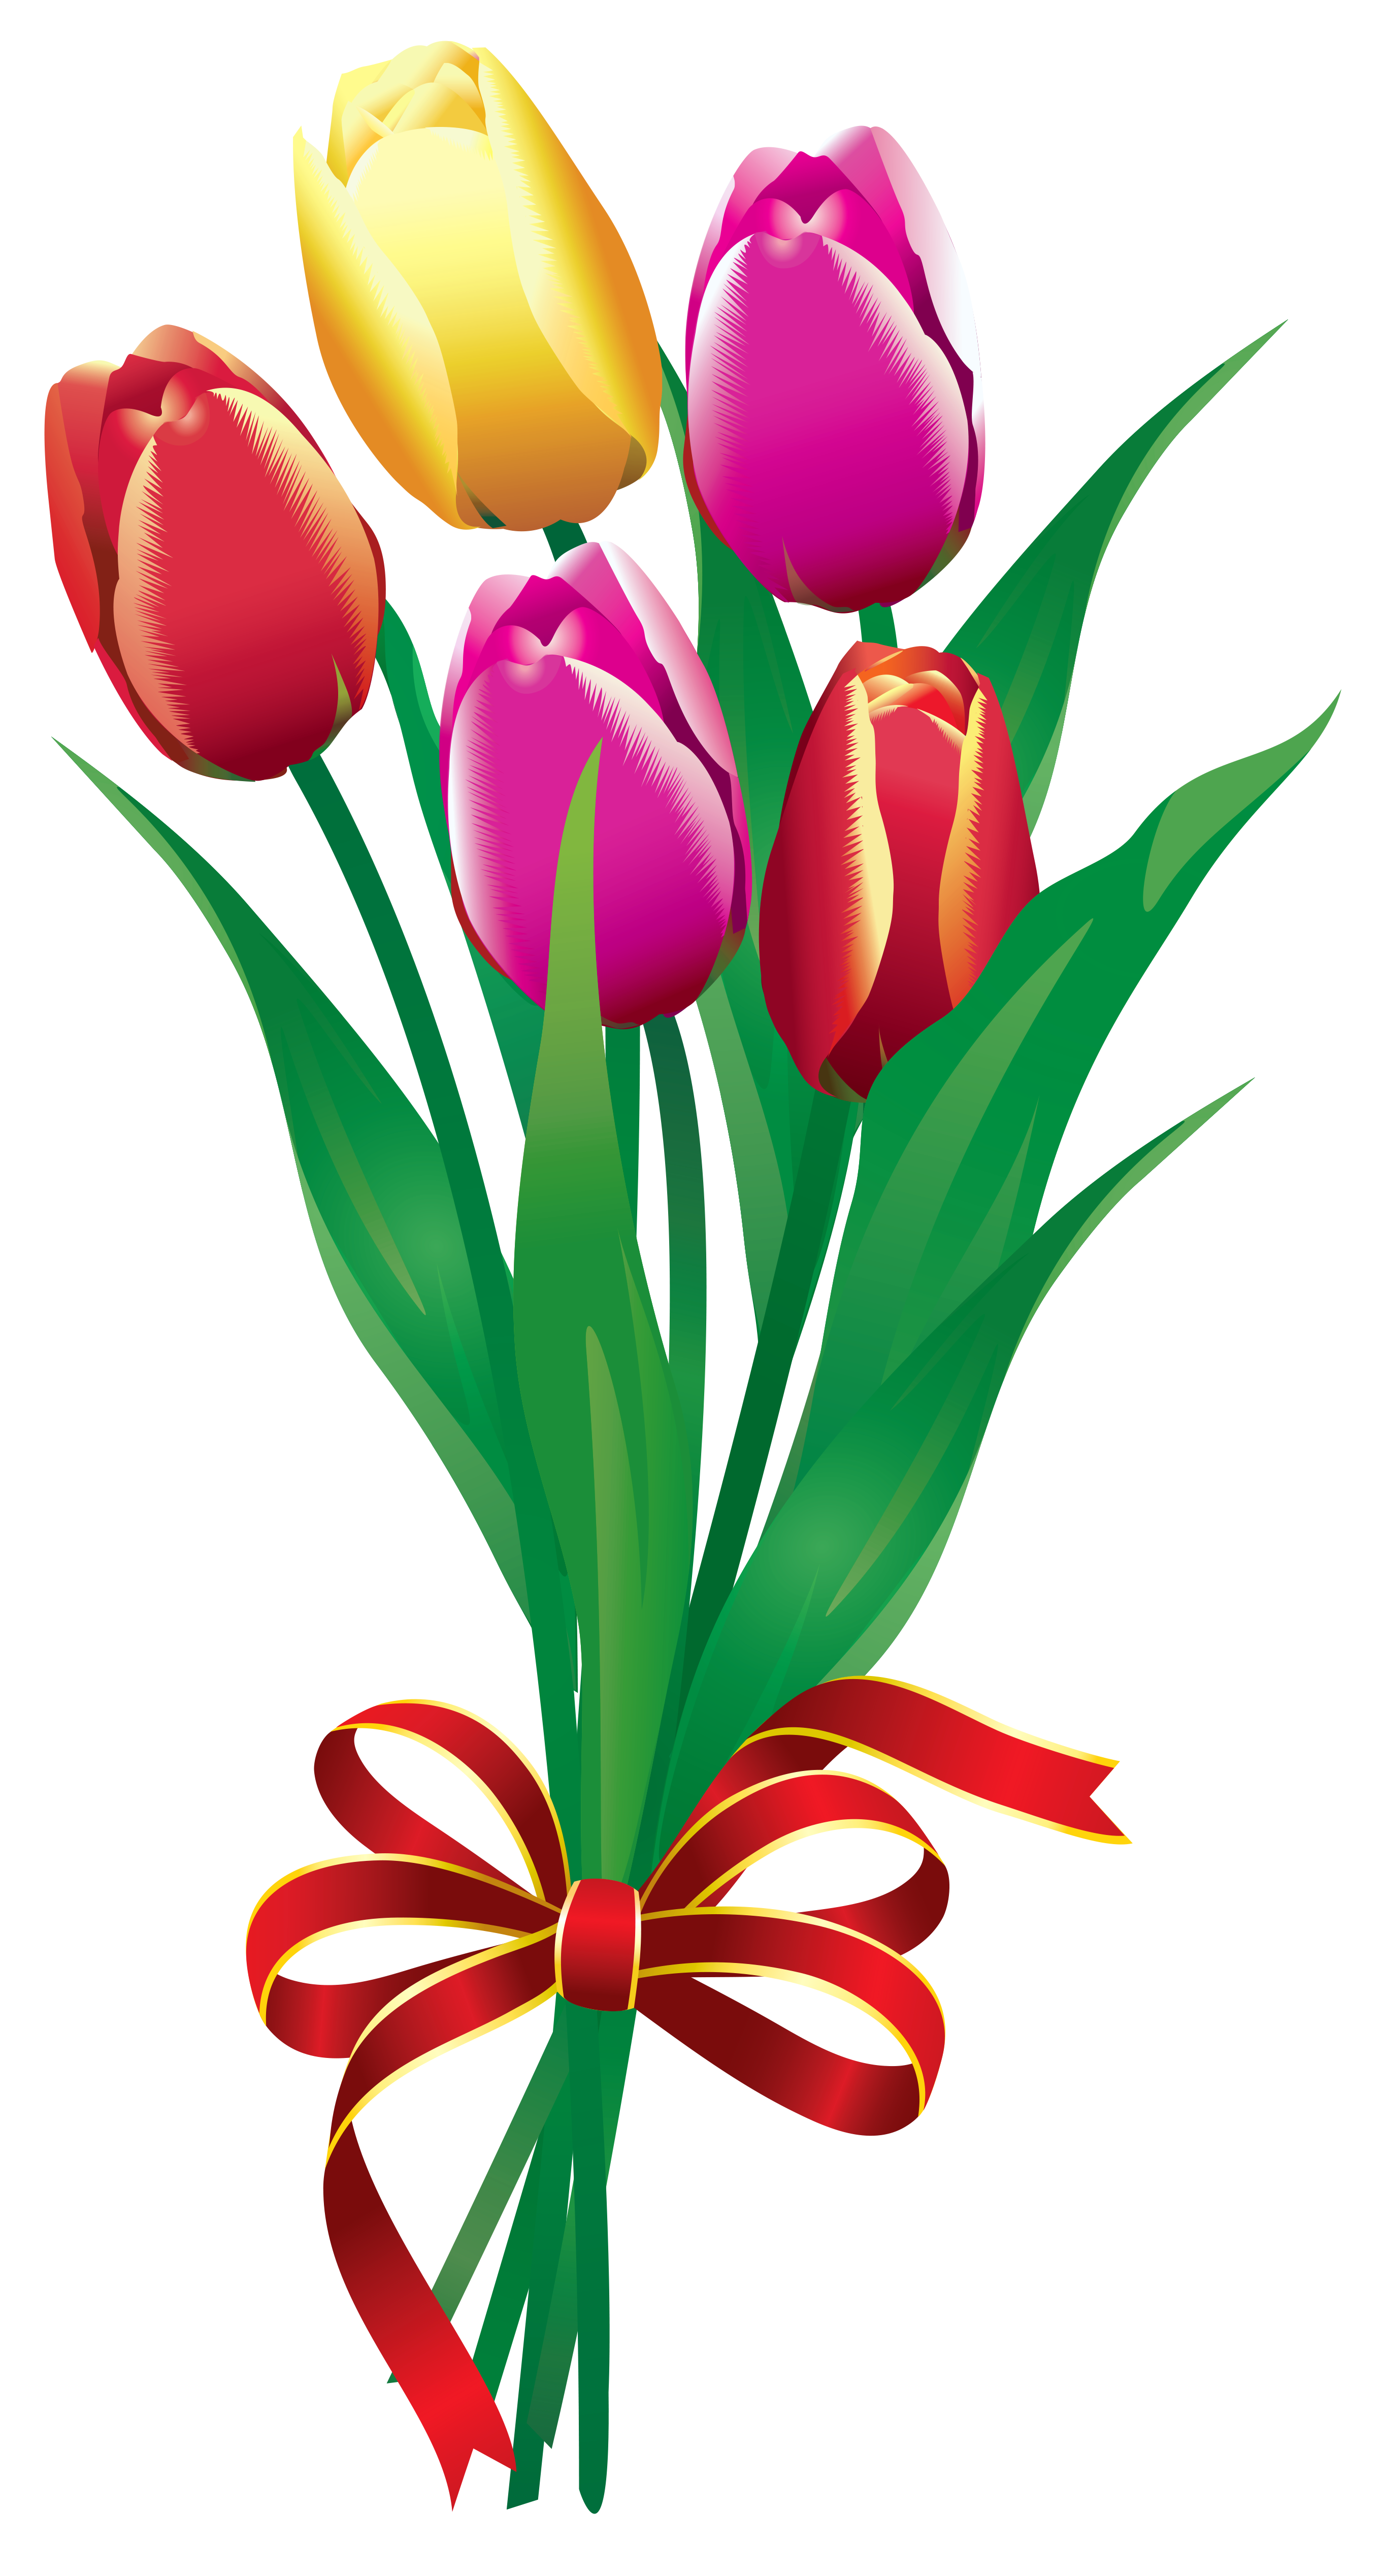 Bouquet Of Flowers Clip Art Free - ClipArt Best